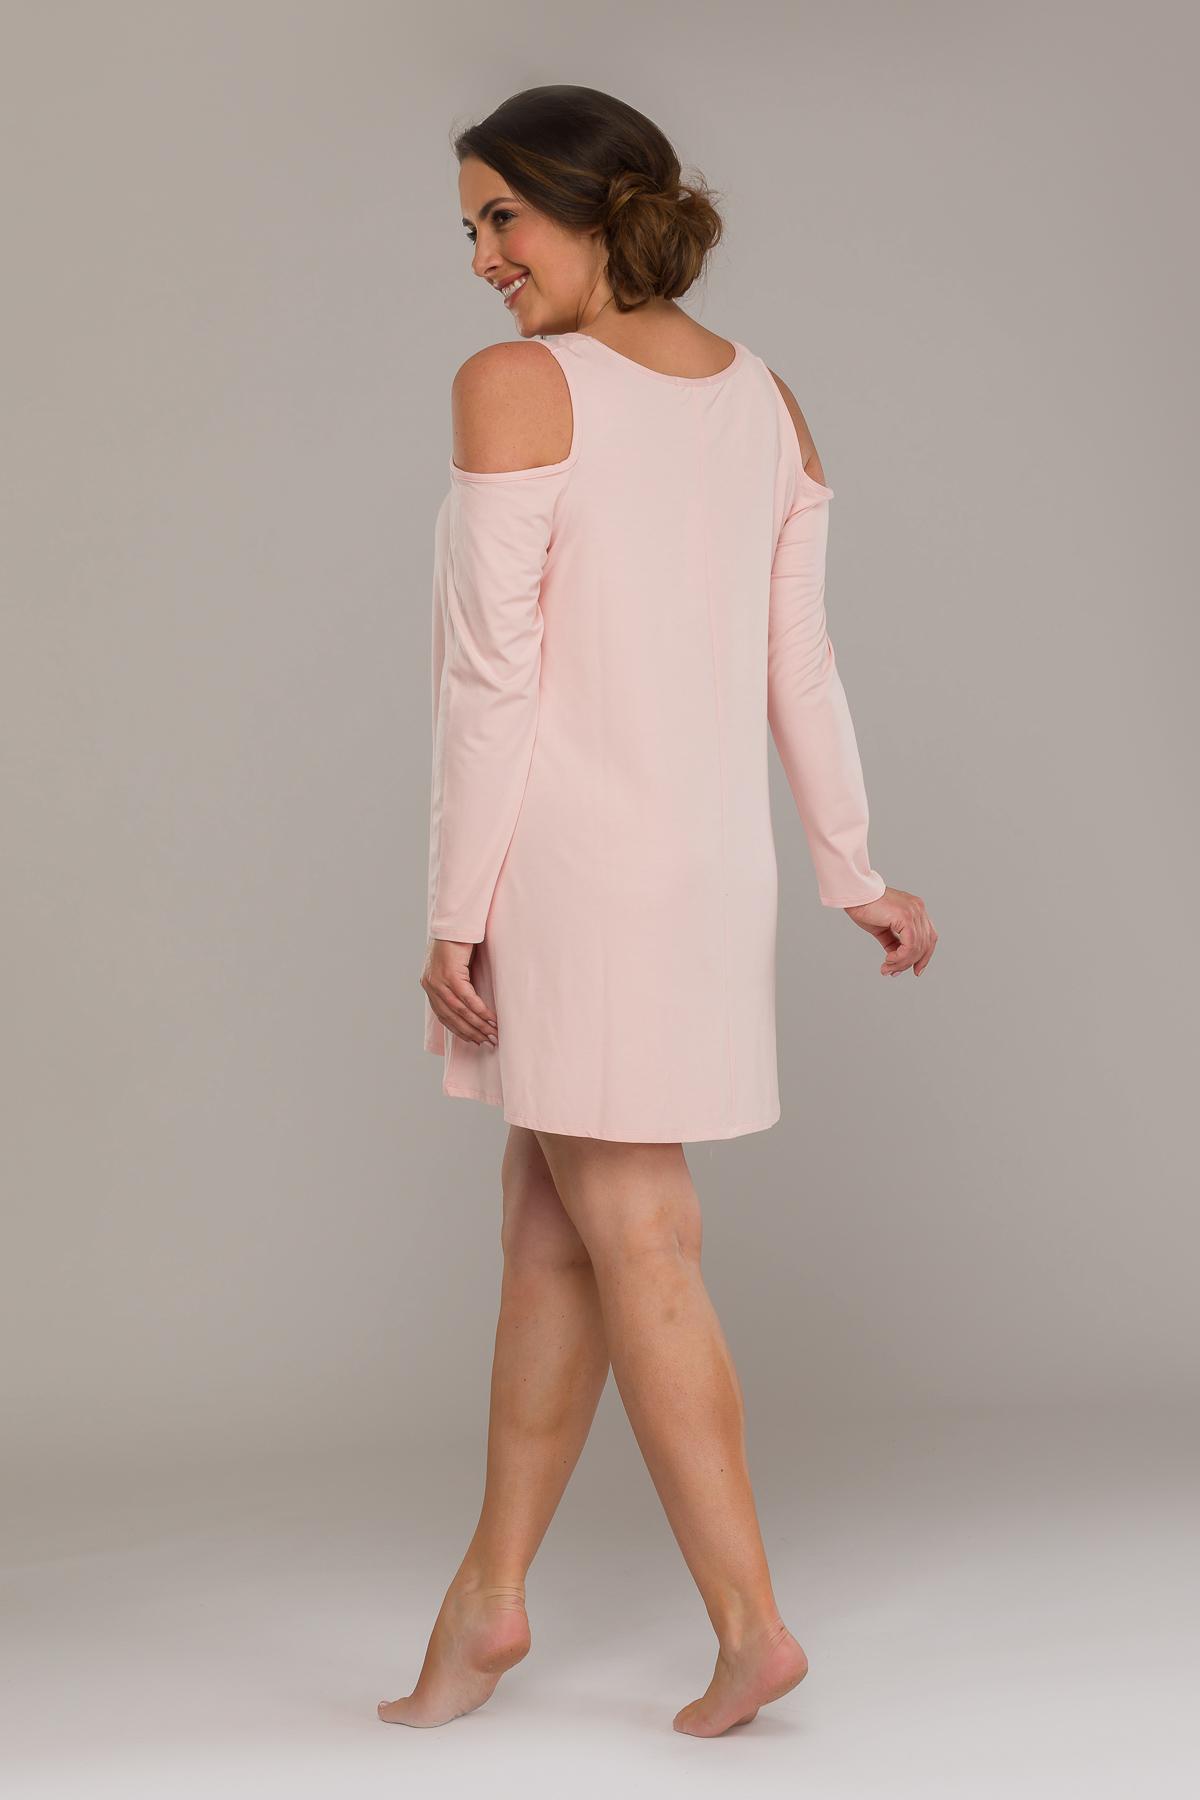 AURORA COLD SHOULDER DRESS ROSA